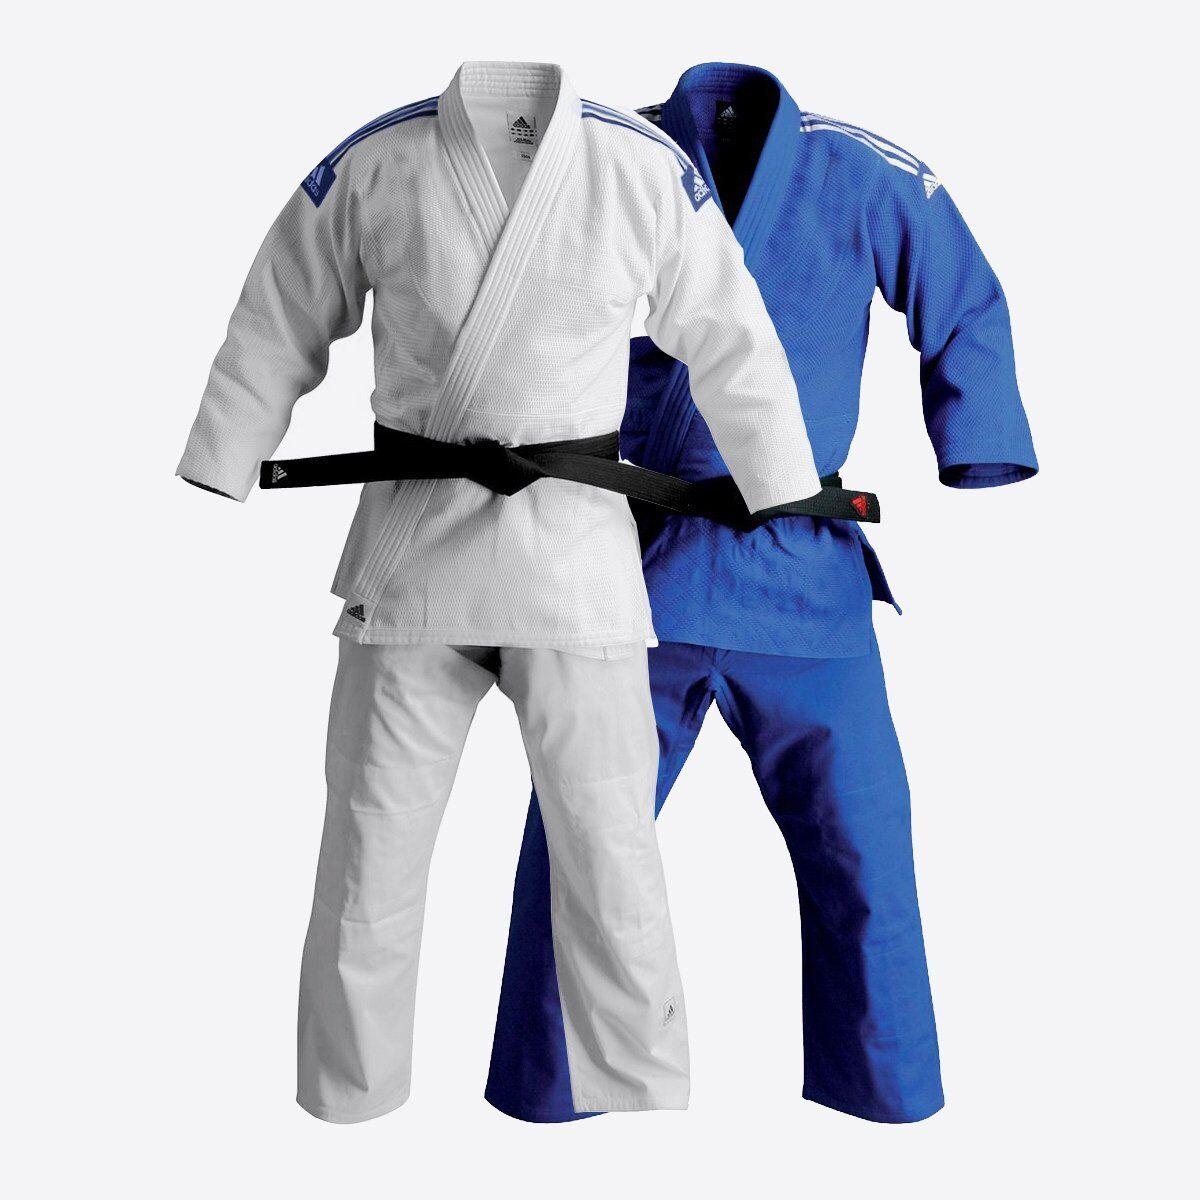 Adidas BJJ, Judo Lightweight  Training Gi w  Belt - 2 colors  we offer various famous brand